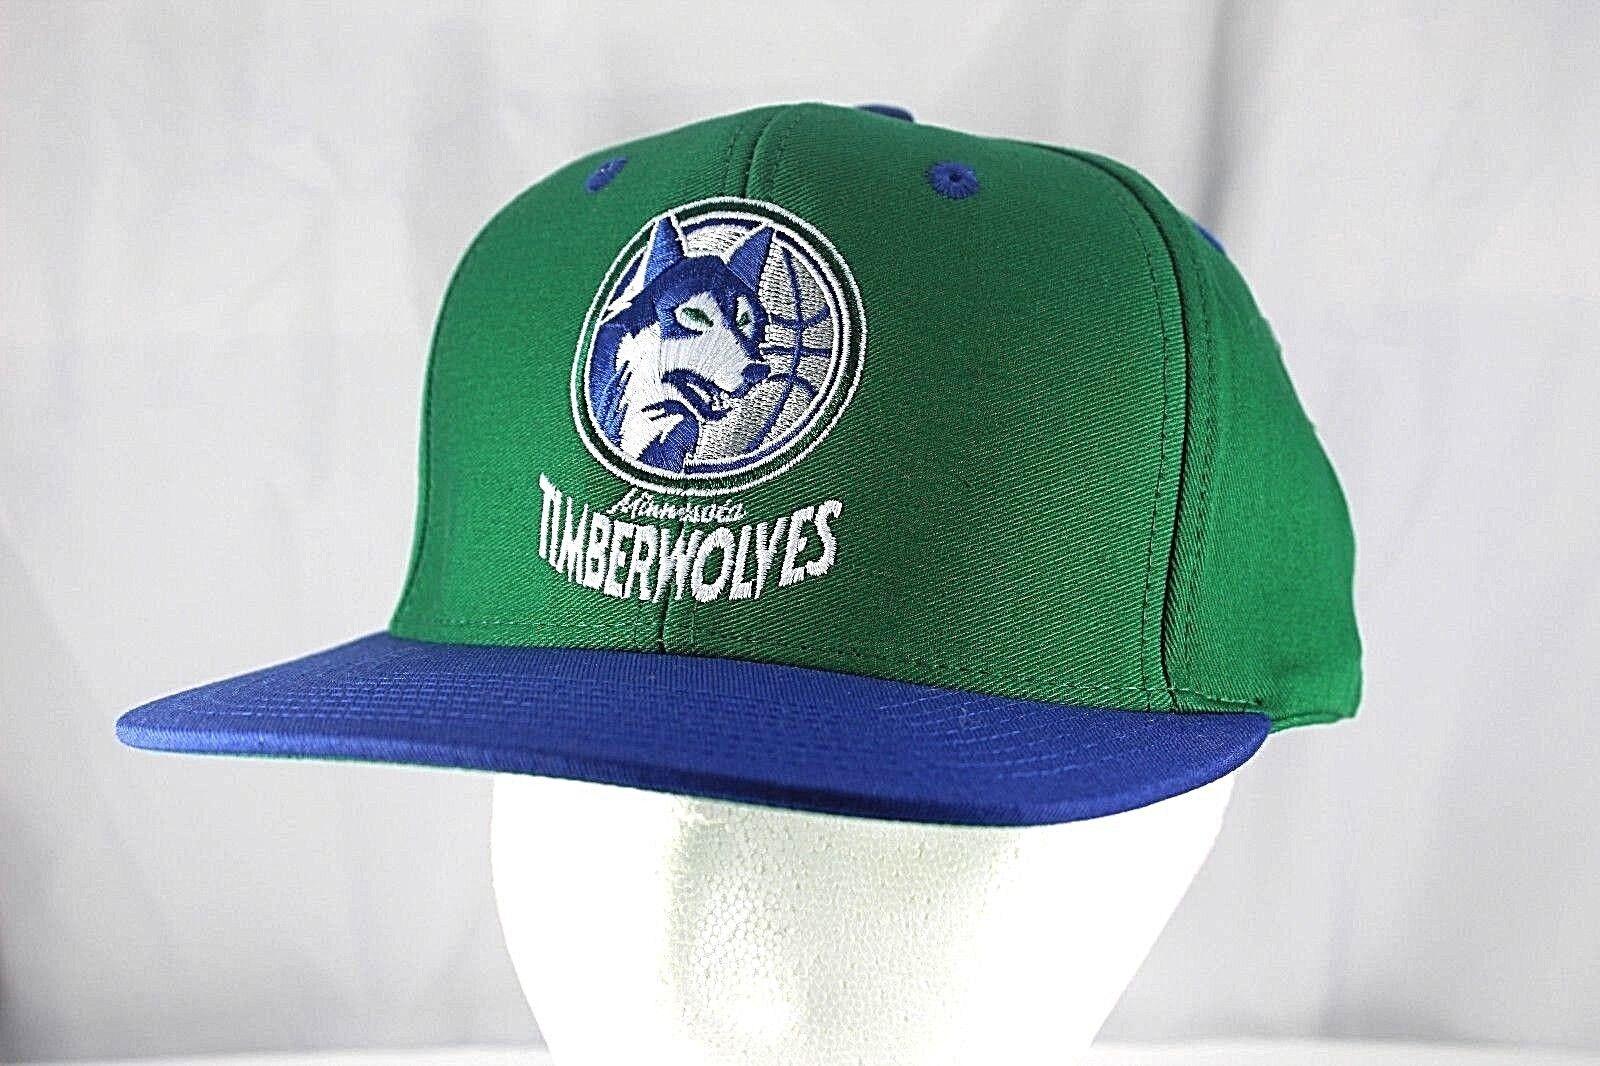 Minnesota Timberwolves NBA Green/Blue NBA Timberwolves Baseball Cap Snapback ba5e14